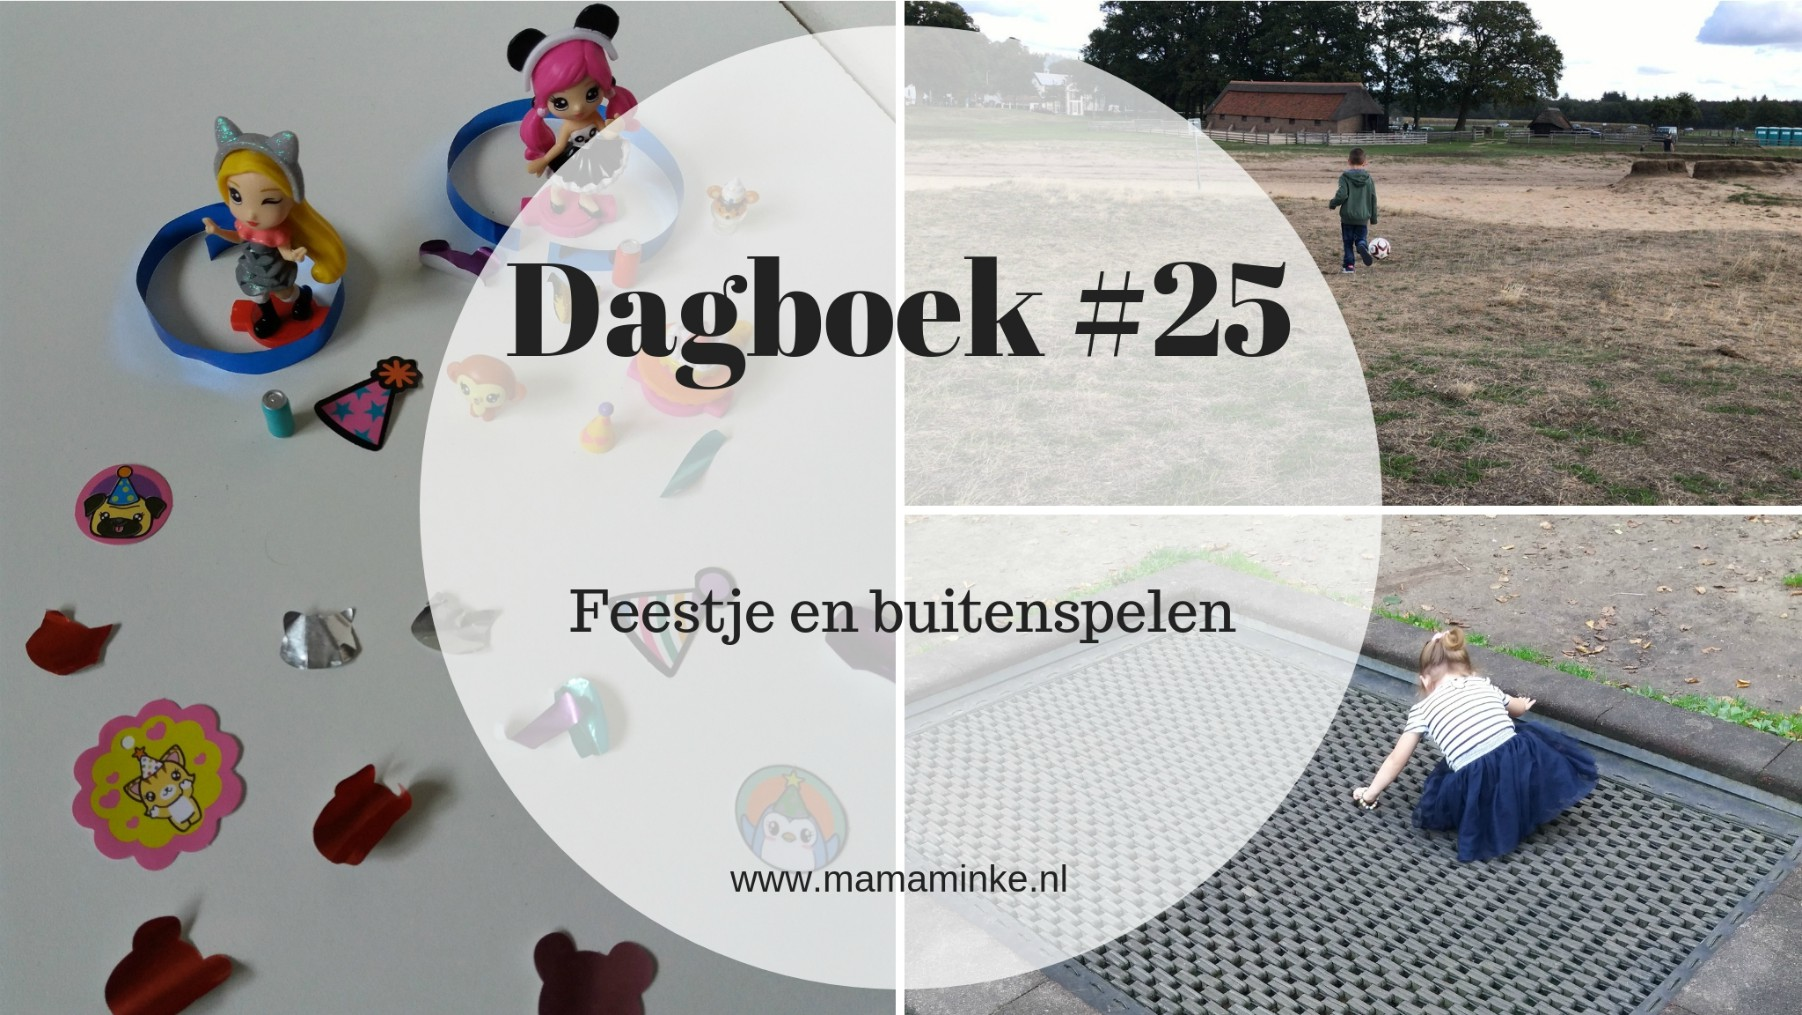 Dagboek #25: feestje en buiten spelen